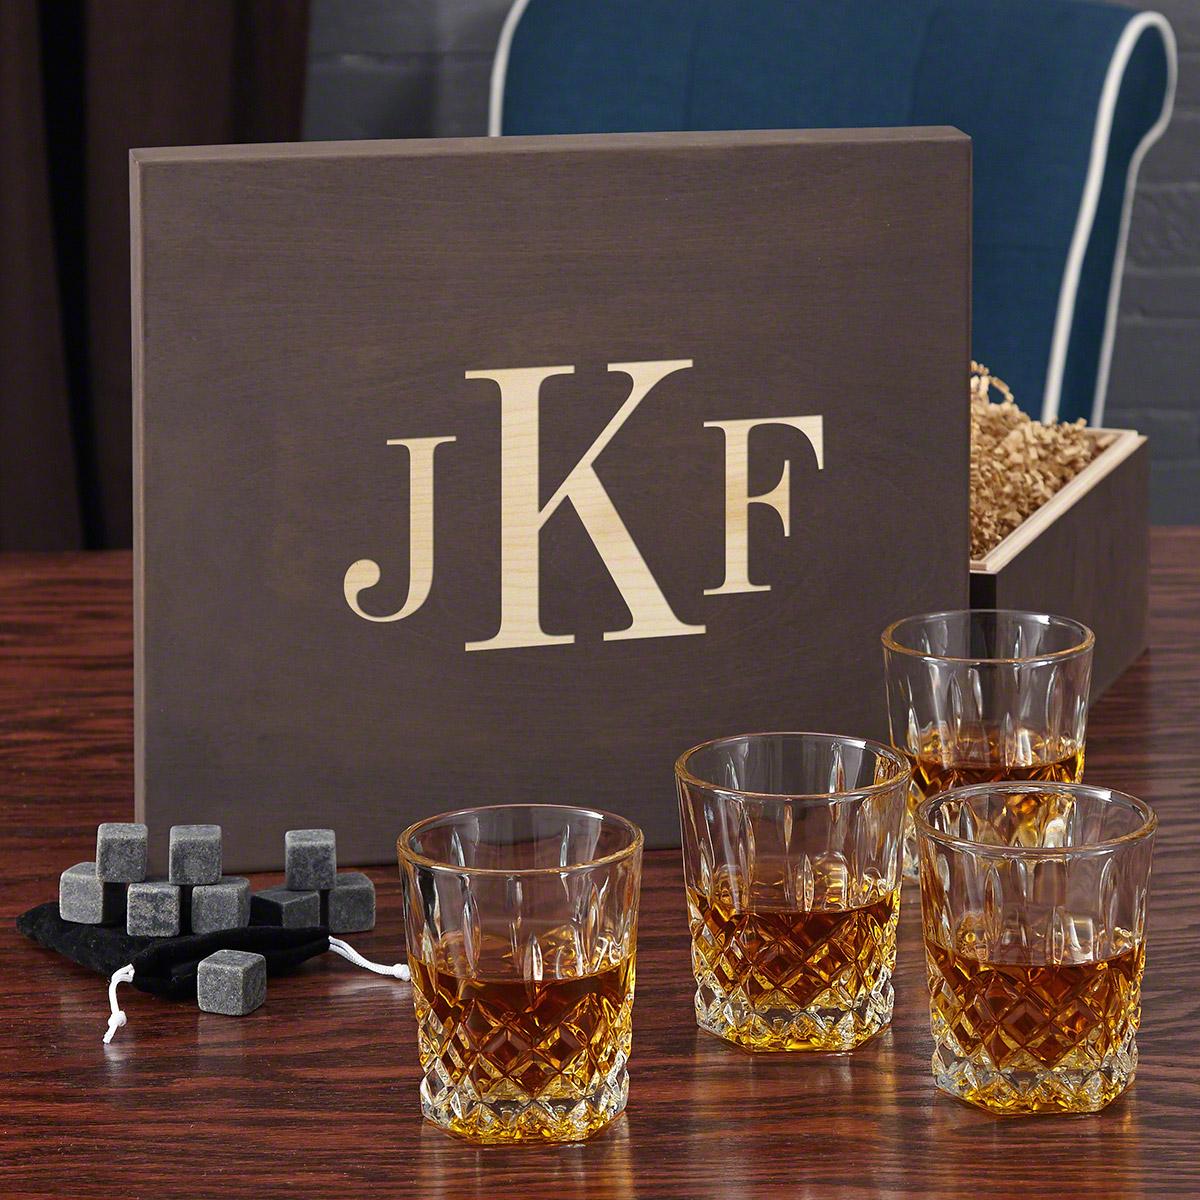 St. Lorenz Whiskey Lovers Gift Set with Monogram Box